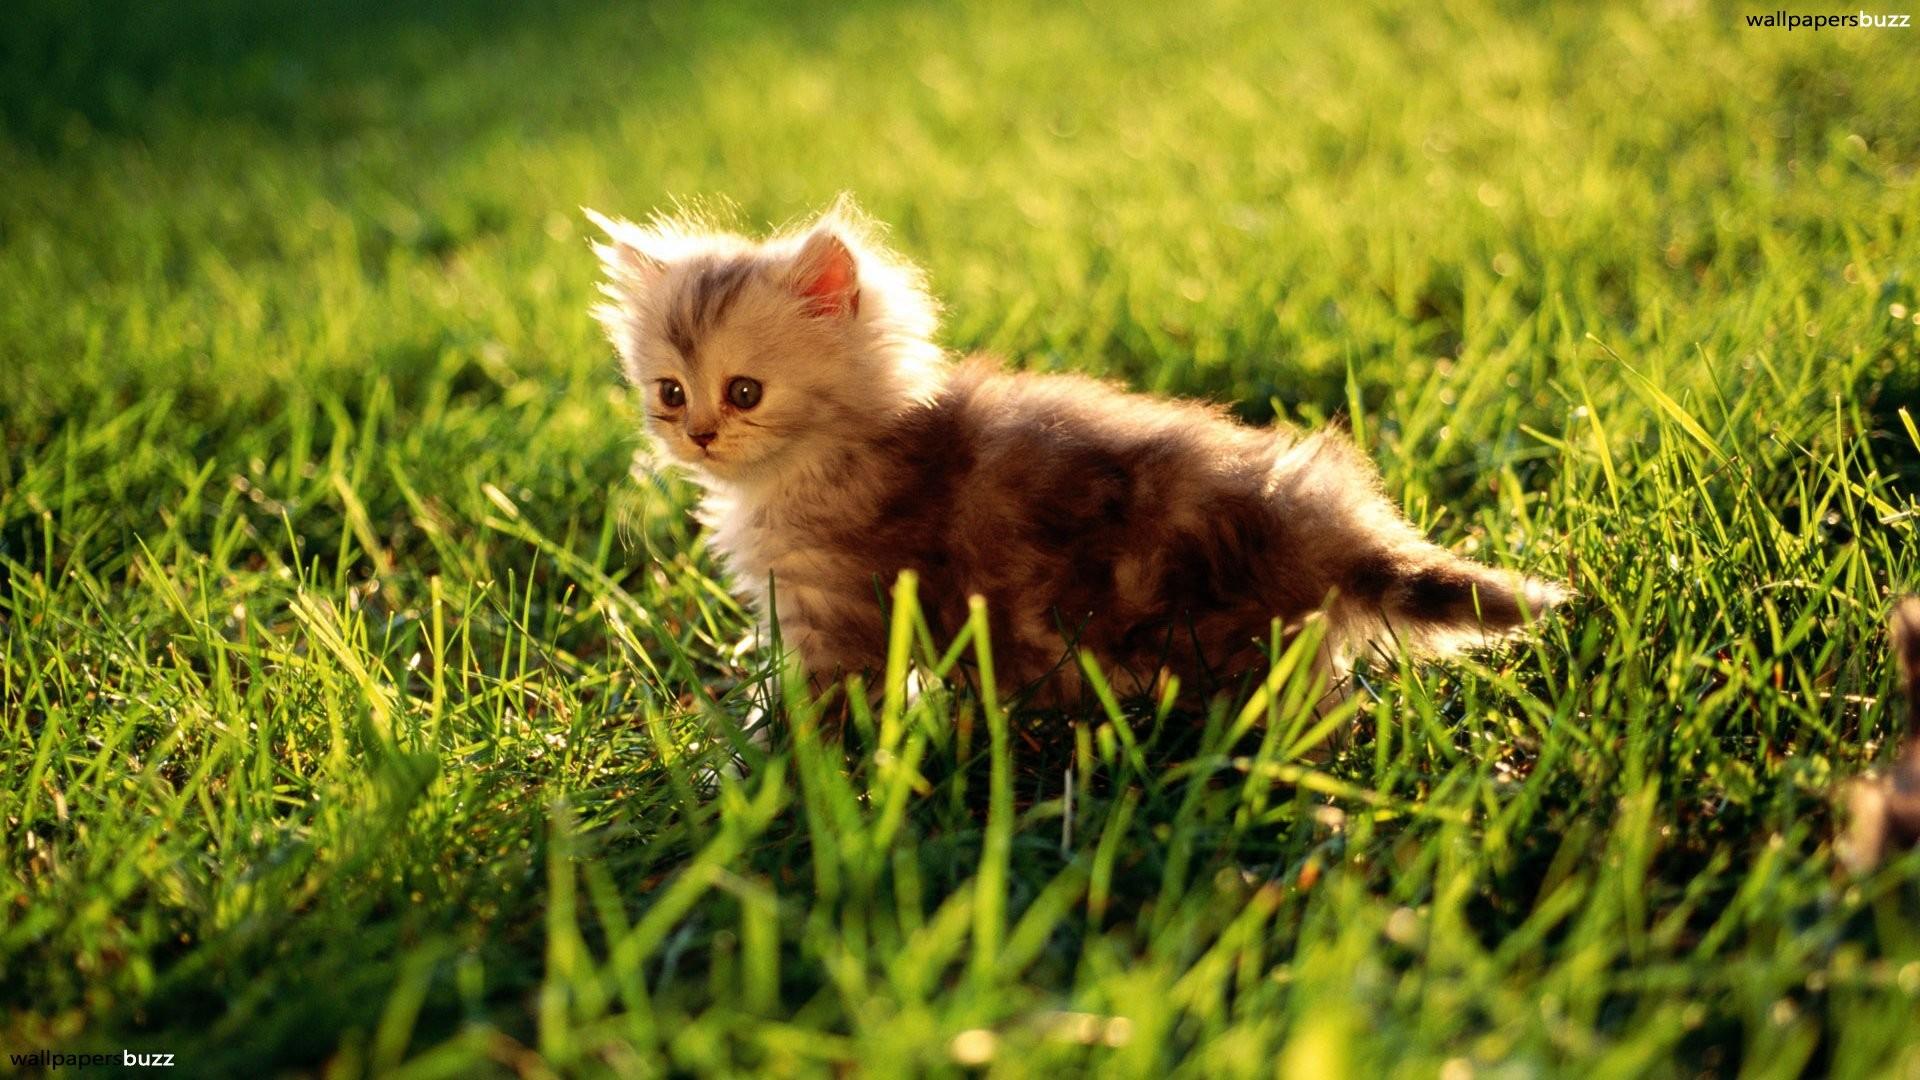 Fluffy Kitten. Kittens Cute Kitten